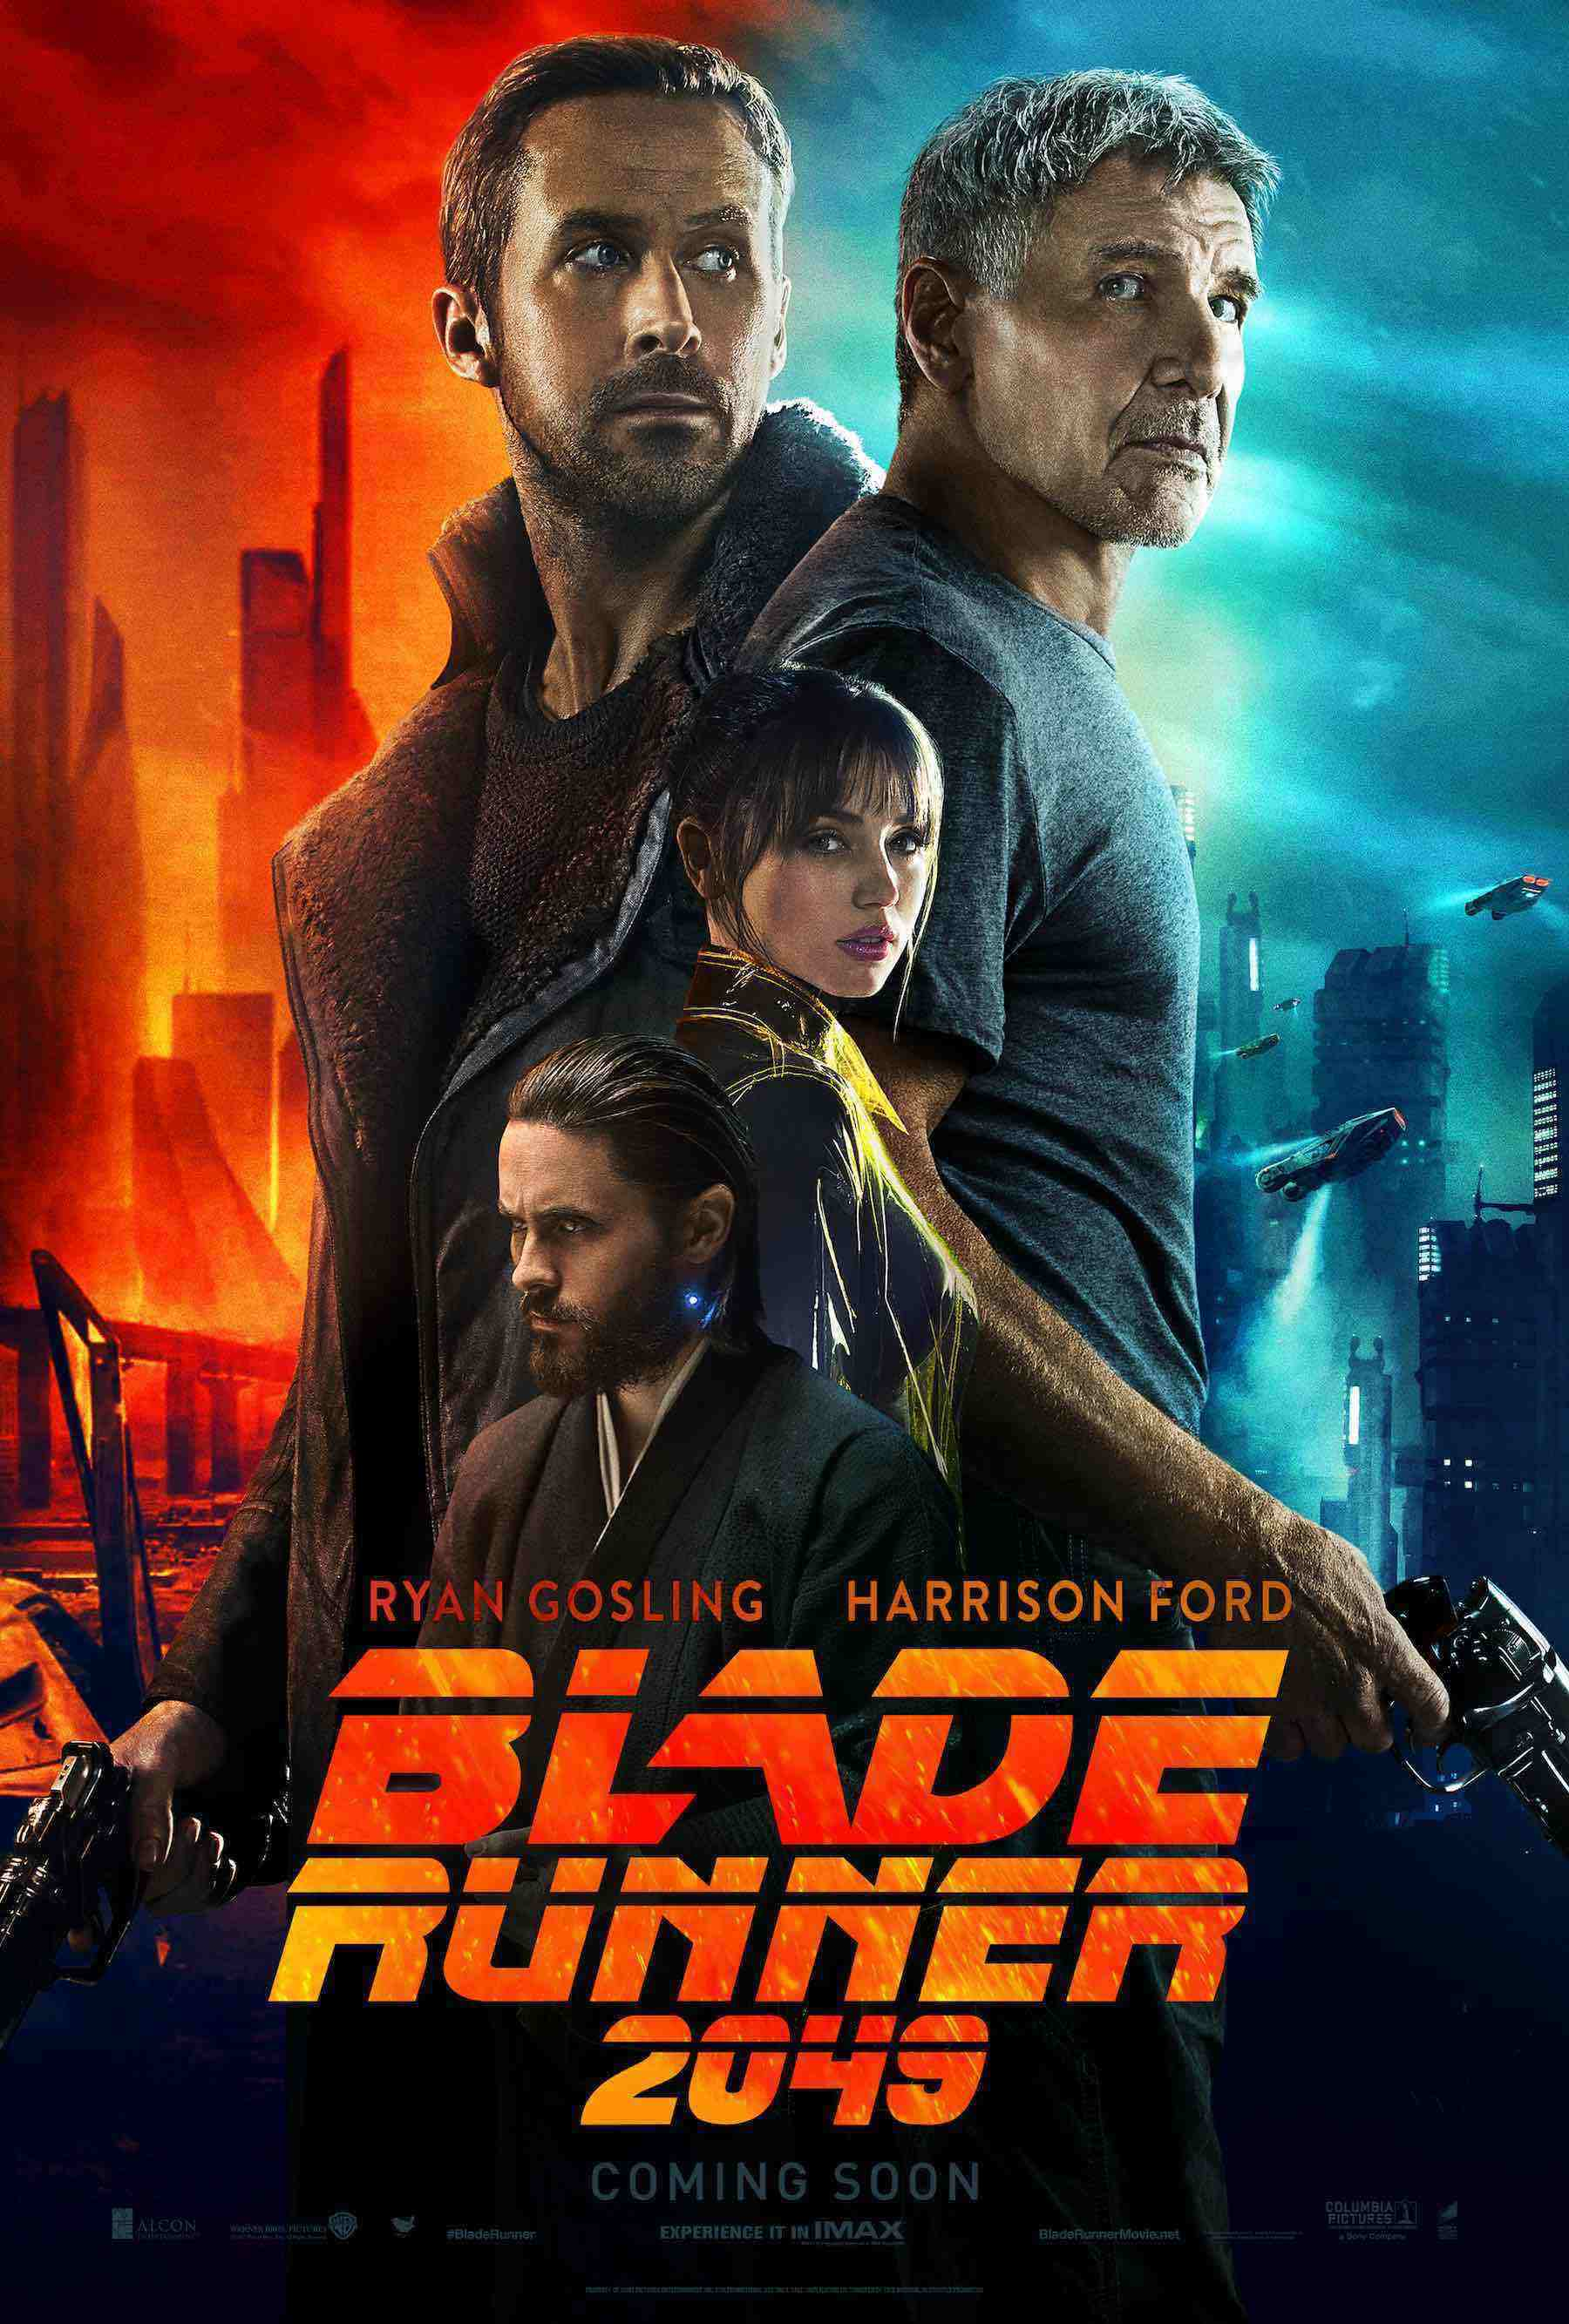 Blade Runner 2049 film review: how do you make a sequel to Ridley Scott's masterpiece?